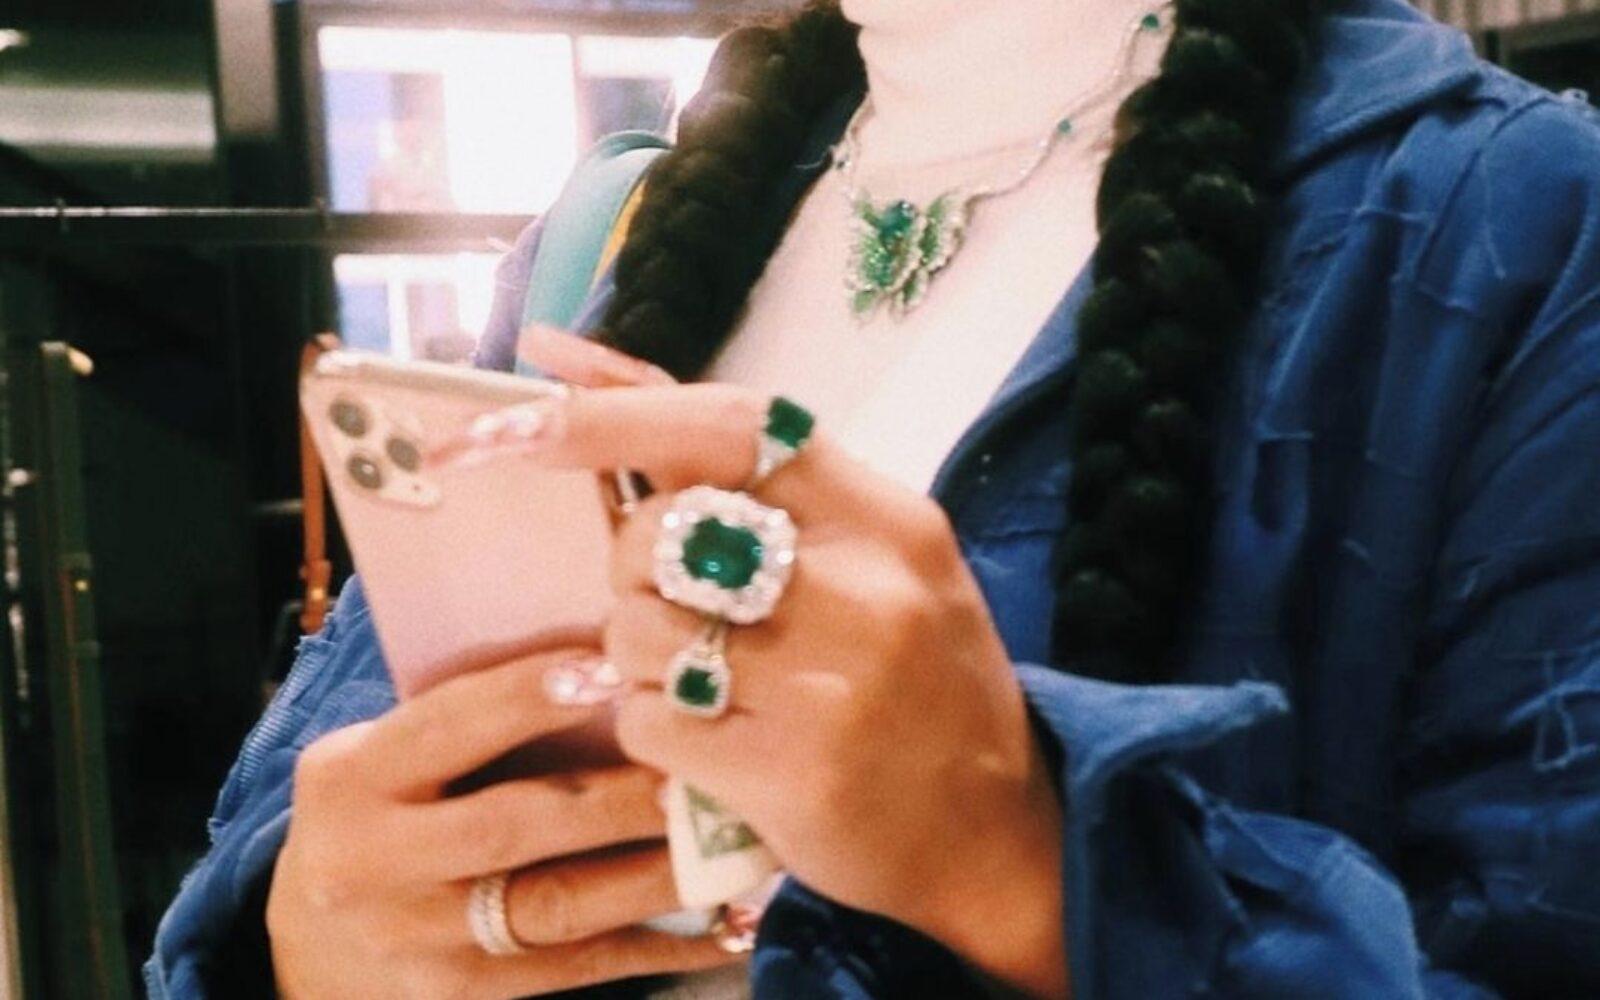 Spring high jewellery